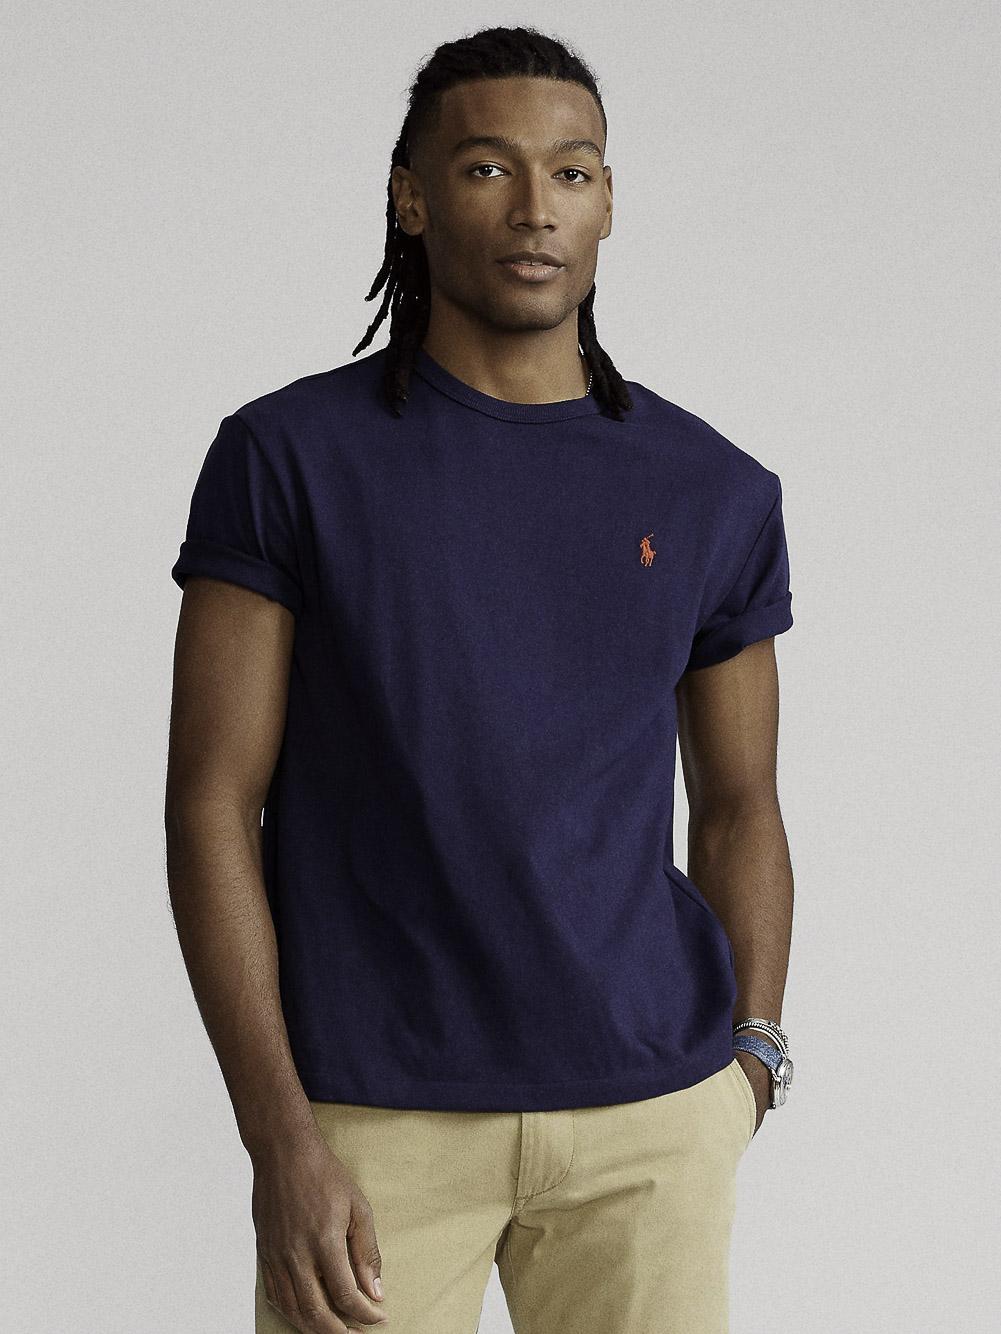 POLO RALPH LAUREN Μπλούζα T-Shirt 710680785004 ΜΠΛΕ